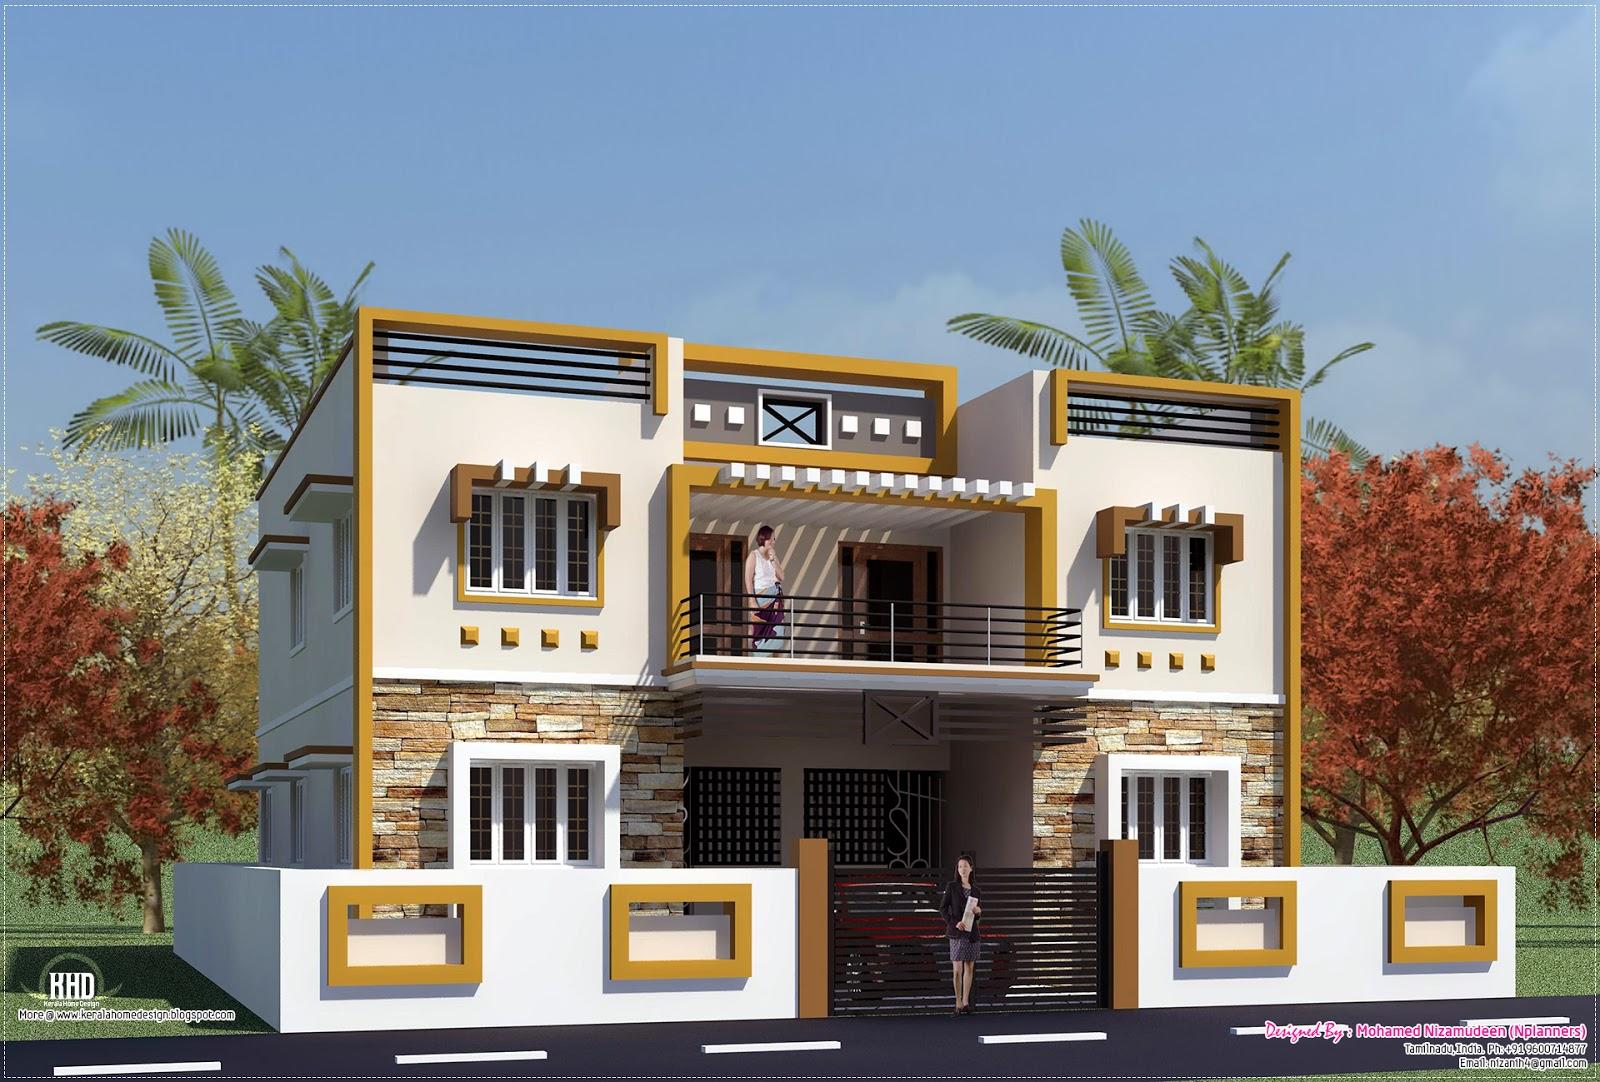 Design Of Small Rcc House | Modern Design